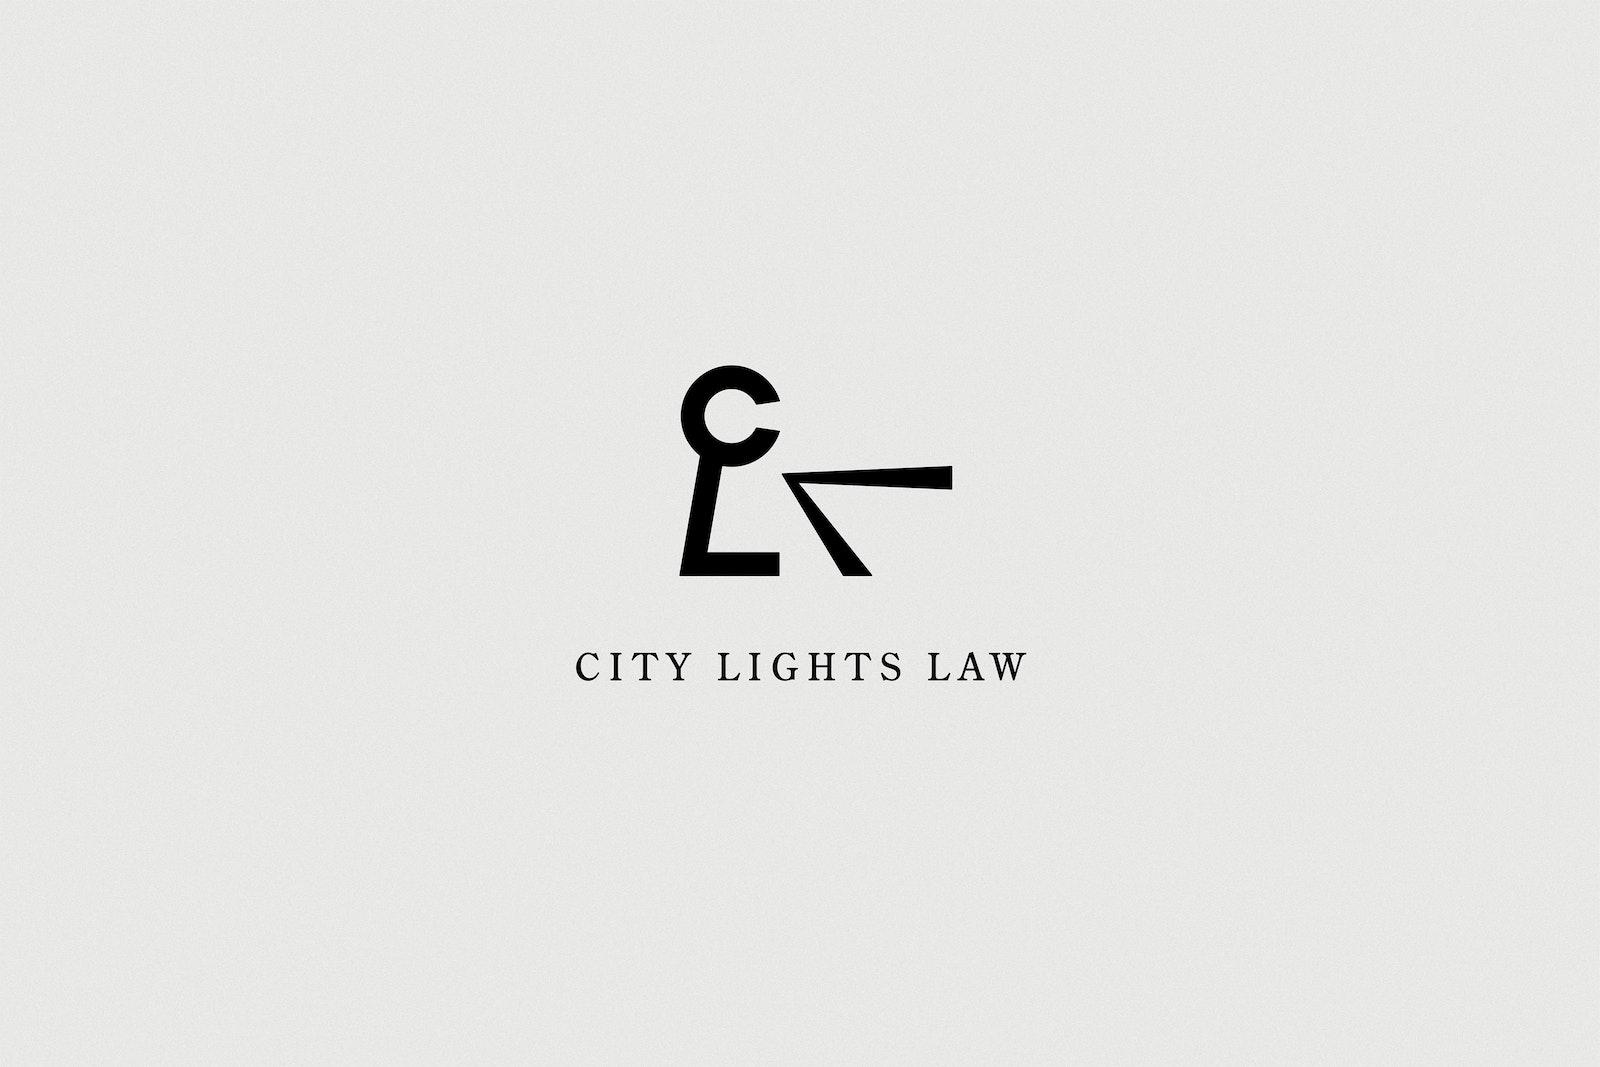 City Lights Law